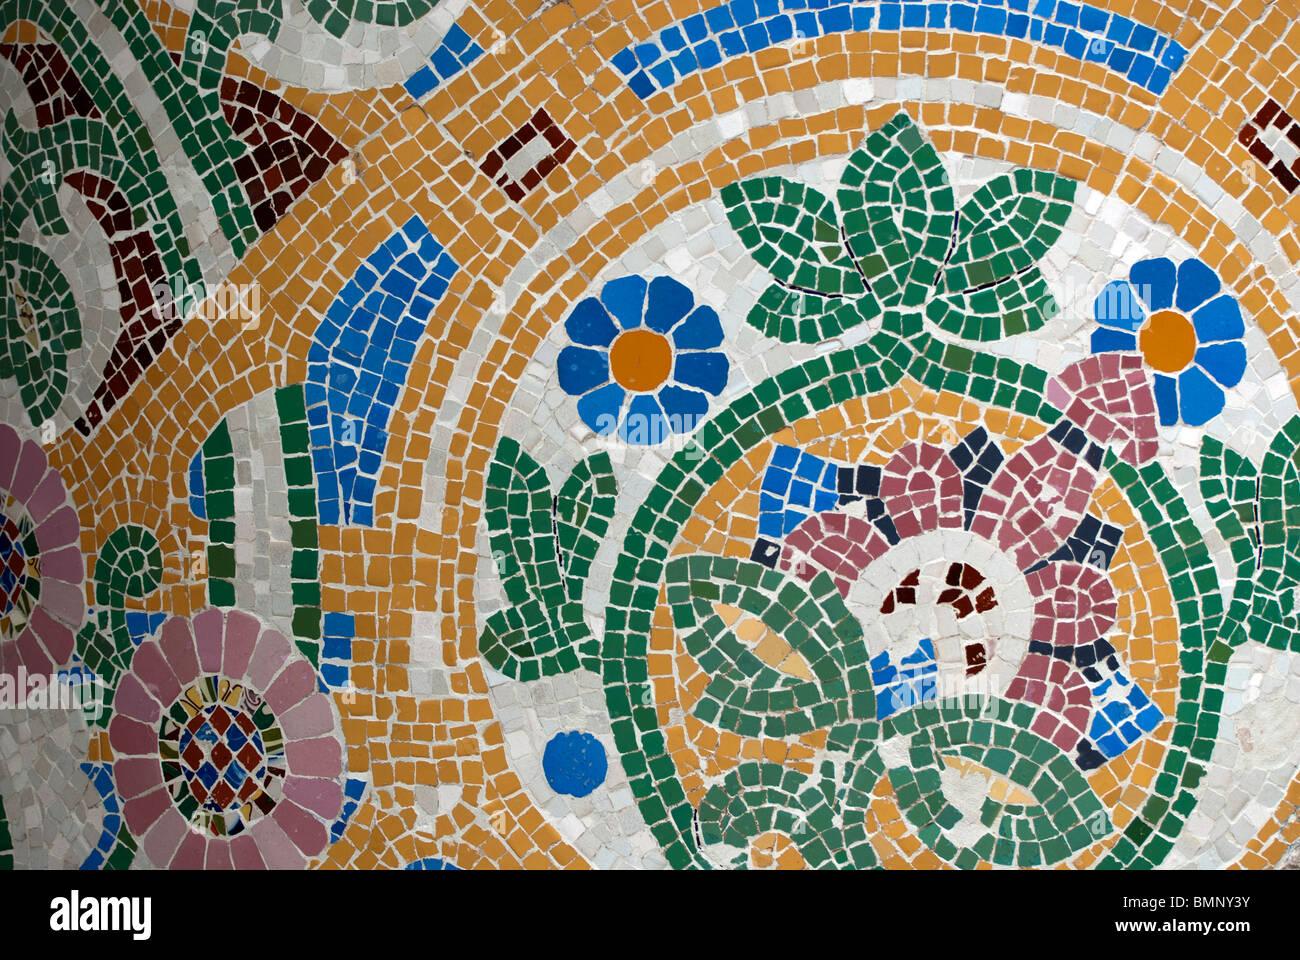 Palau de la Música Catalana, detalle Imagen De Stock